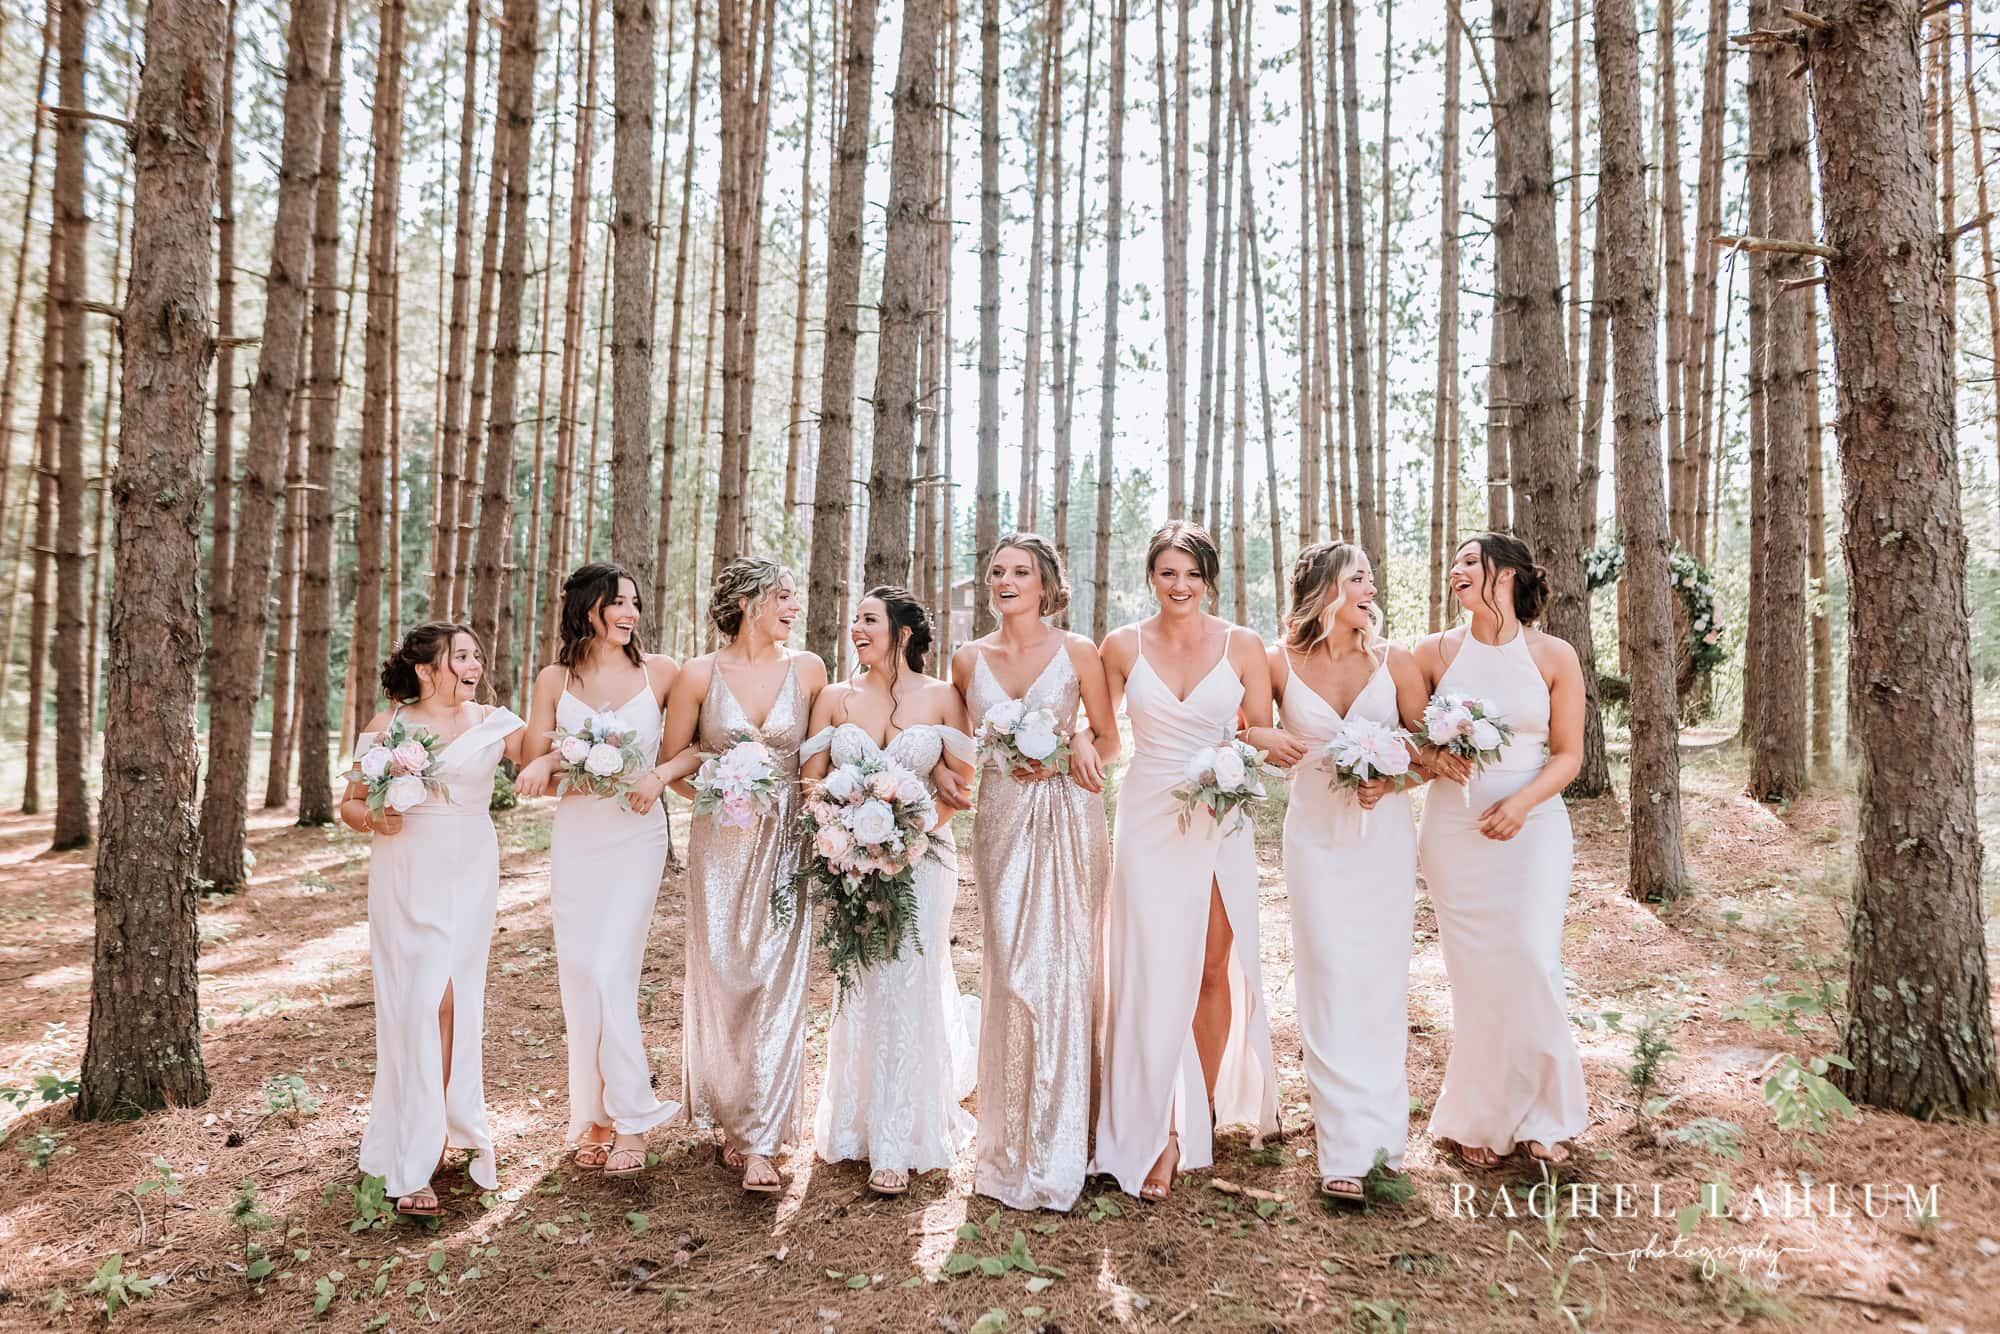 Bride and bridesmaids laugh and walk through the trees around Wilderness Wedding Barn in Bigfork, Minnesota.